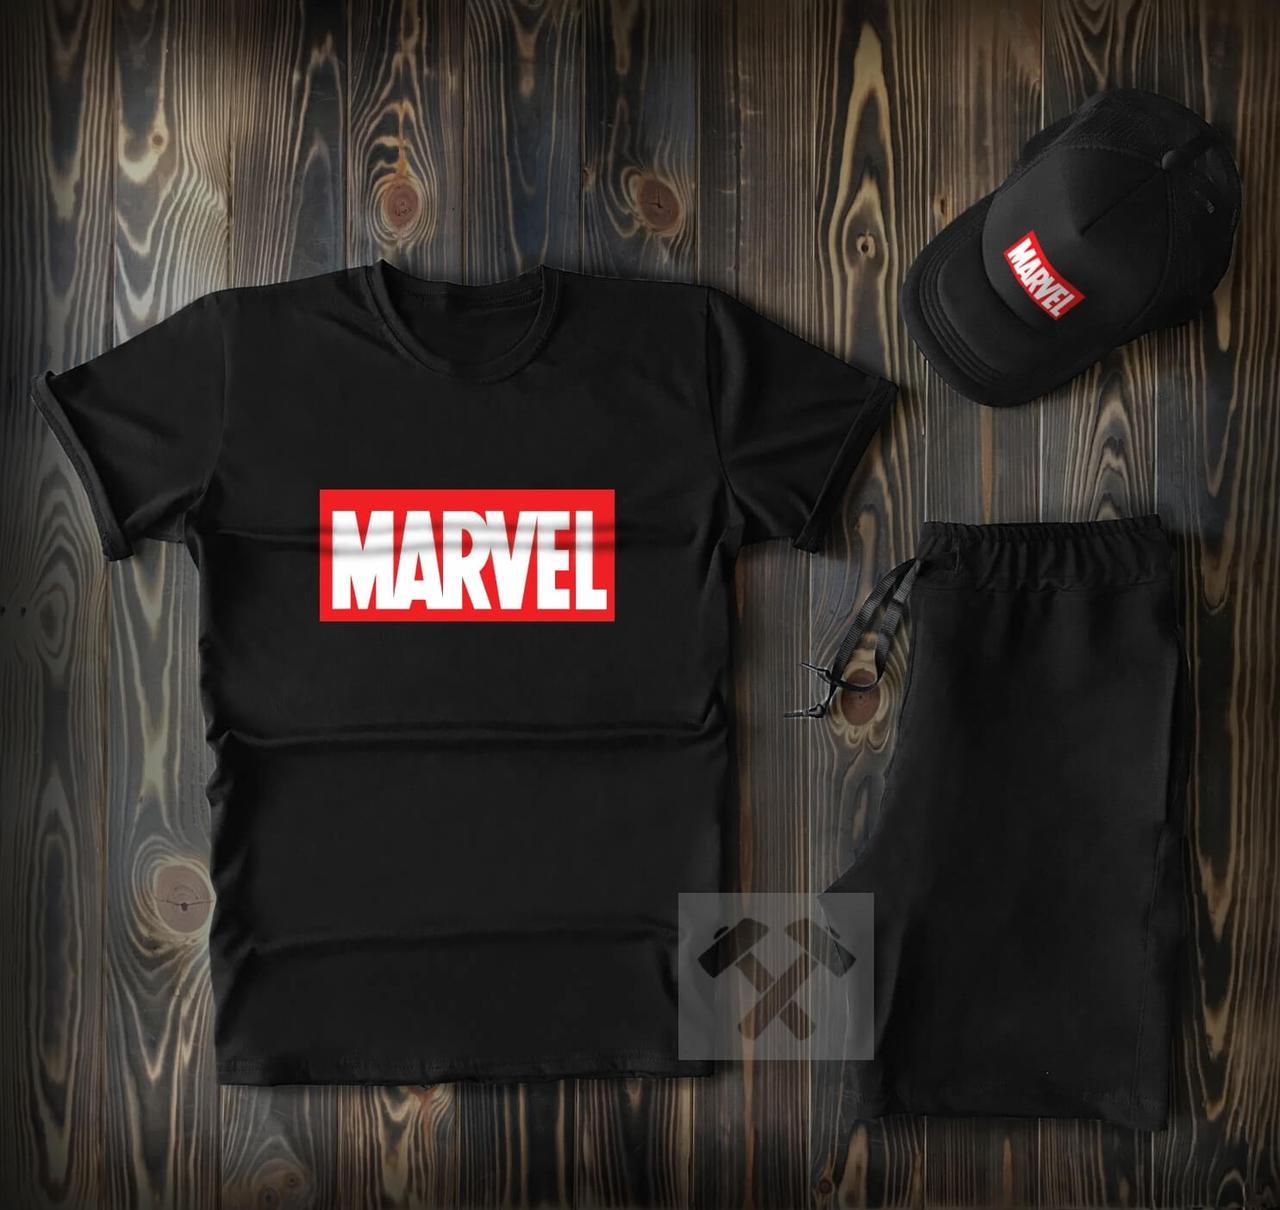 a8ffd720596a0 Летний недорогой мужской спортивный костюм Marvel - Интернет магазин обуви  «im-РоLLi» в